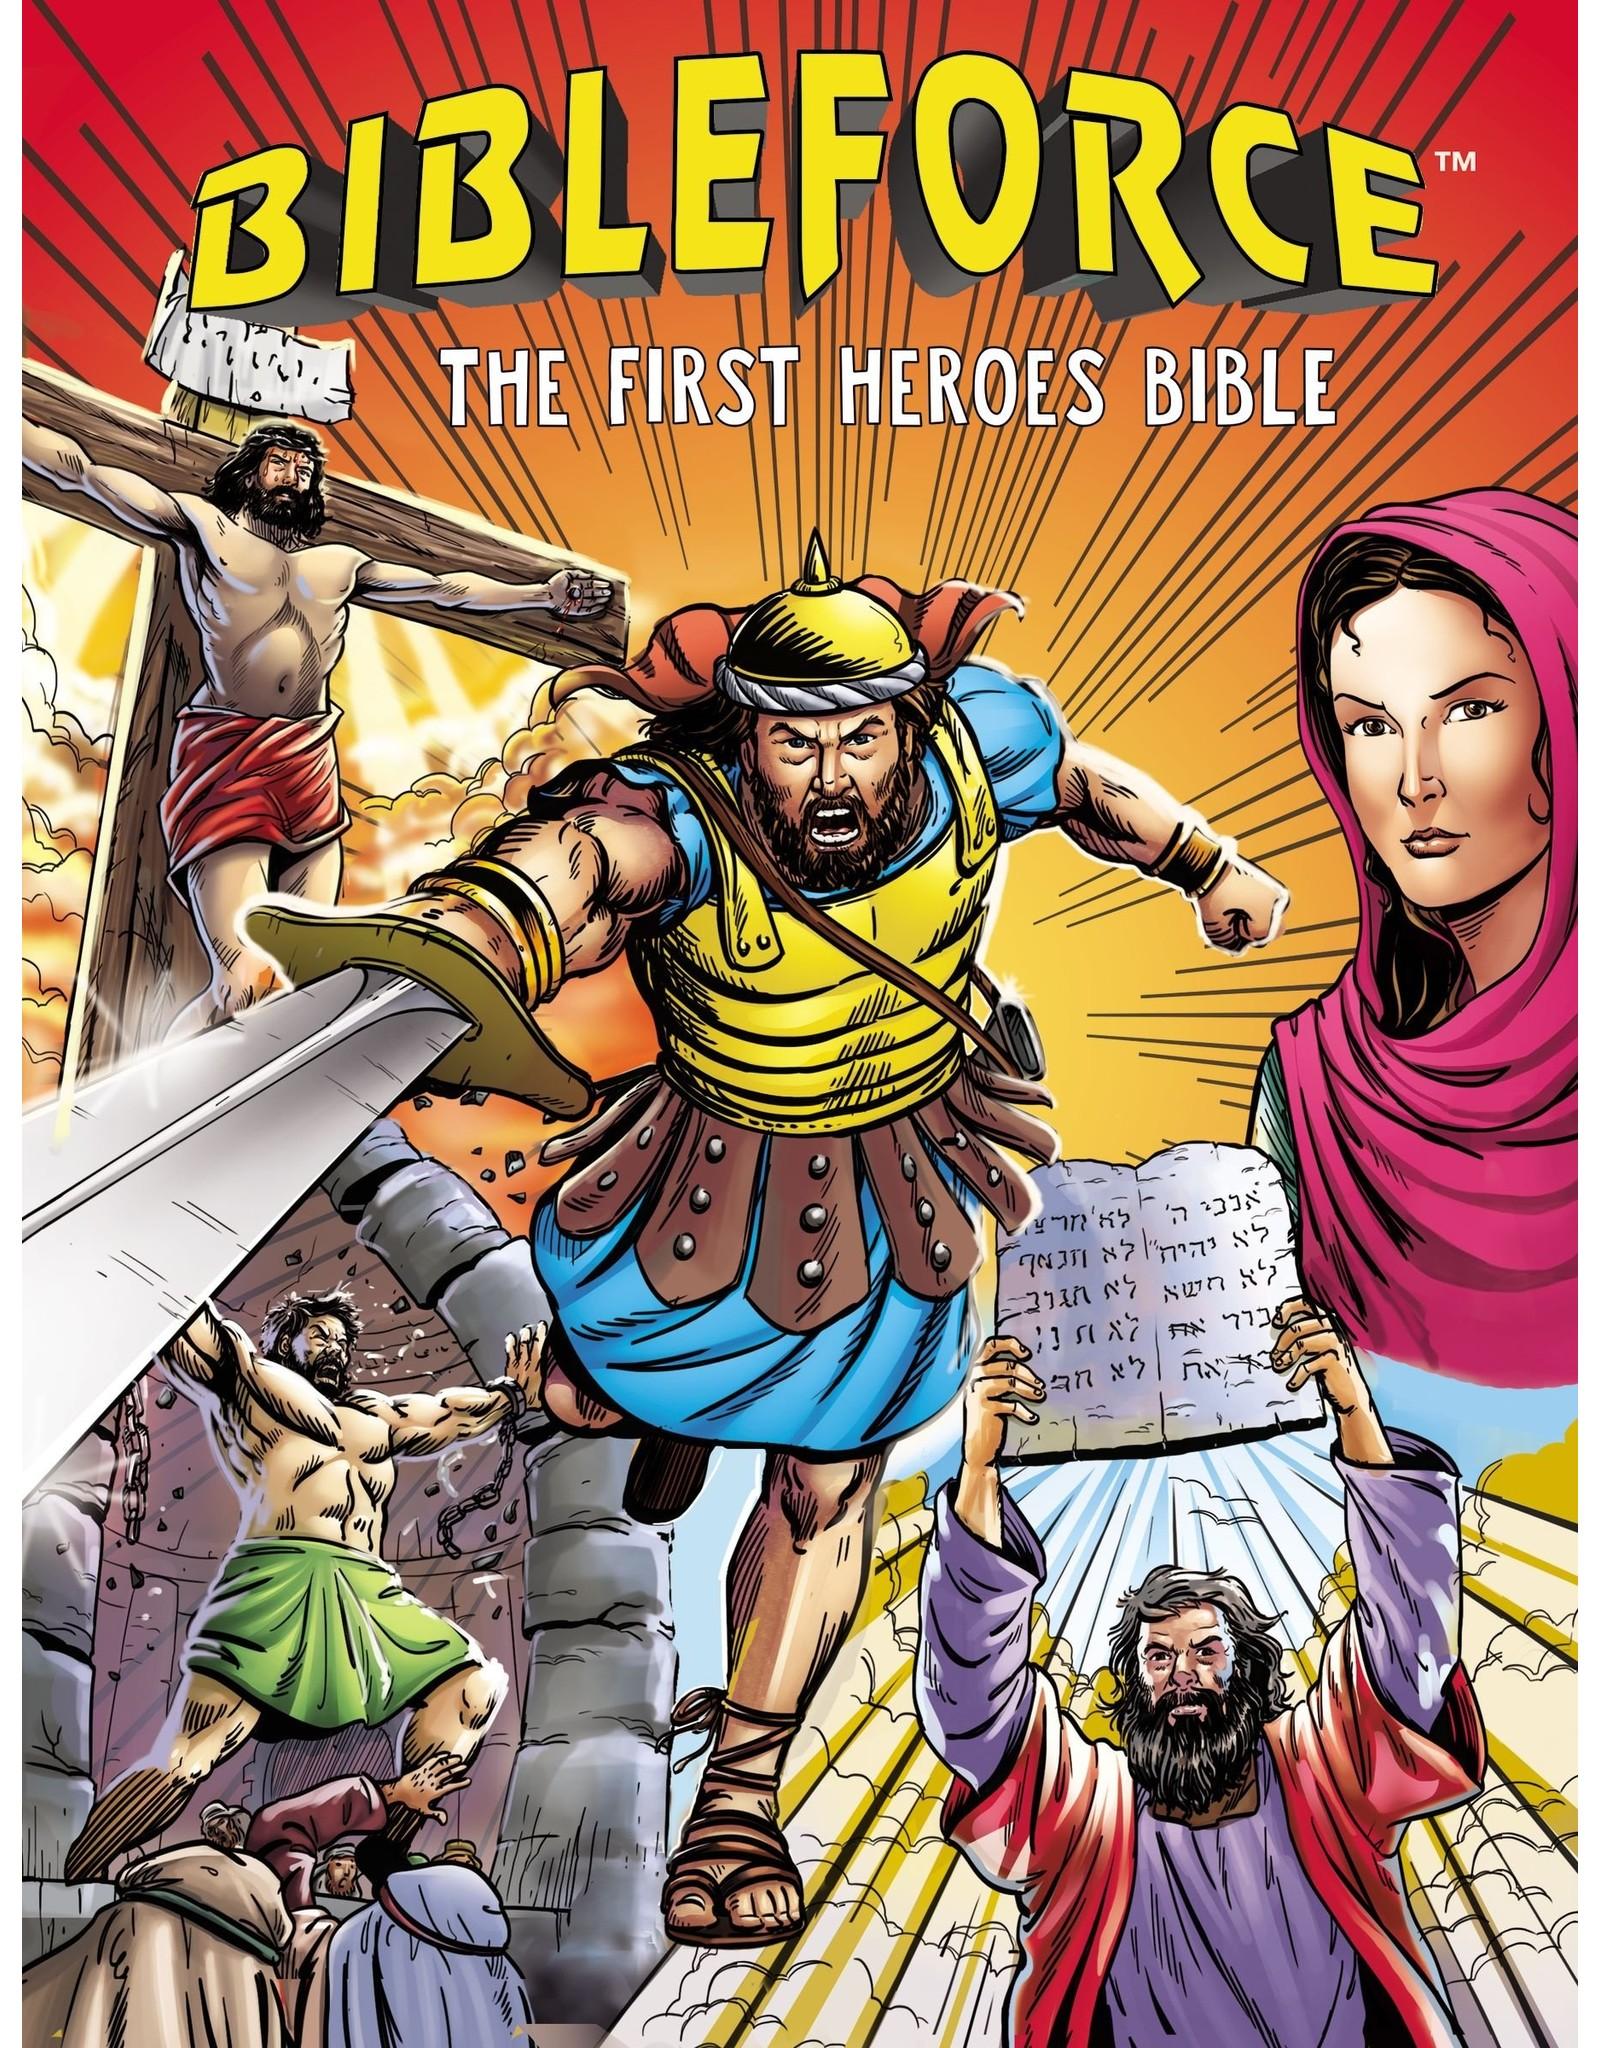 Harper Collins / Thomas Nelson / Zondervan BibleForce: The First Heroes Bible